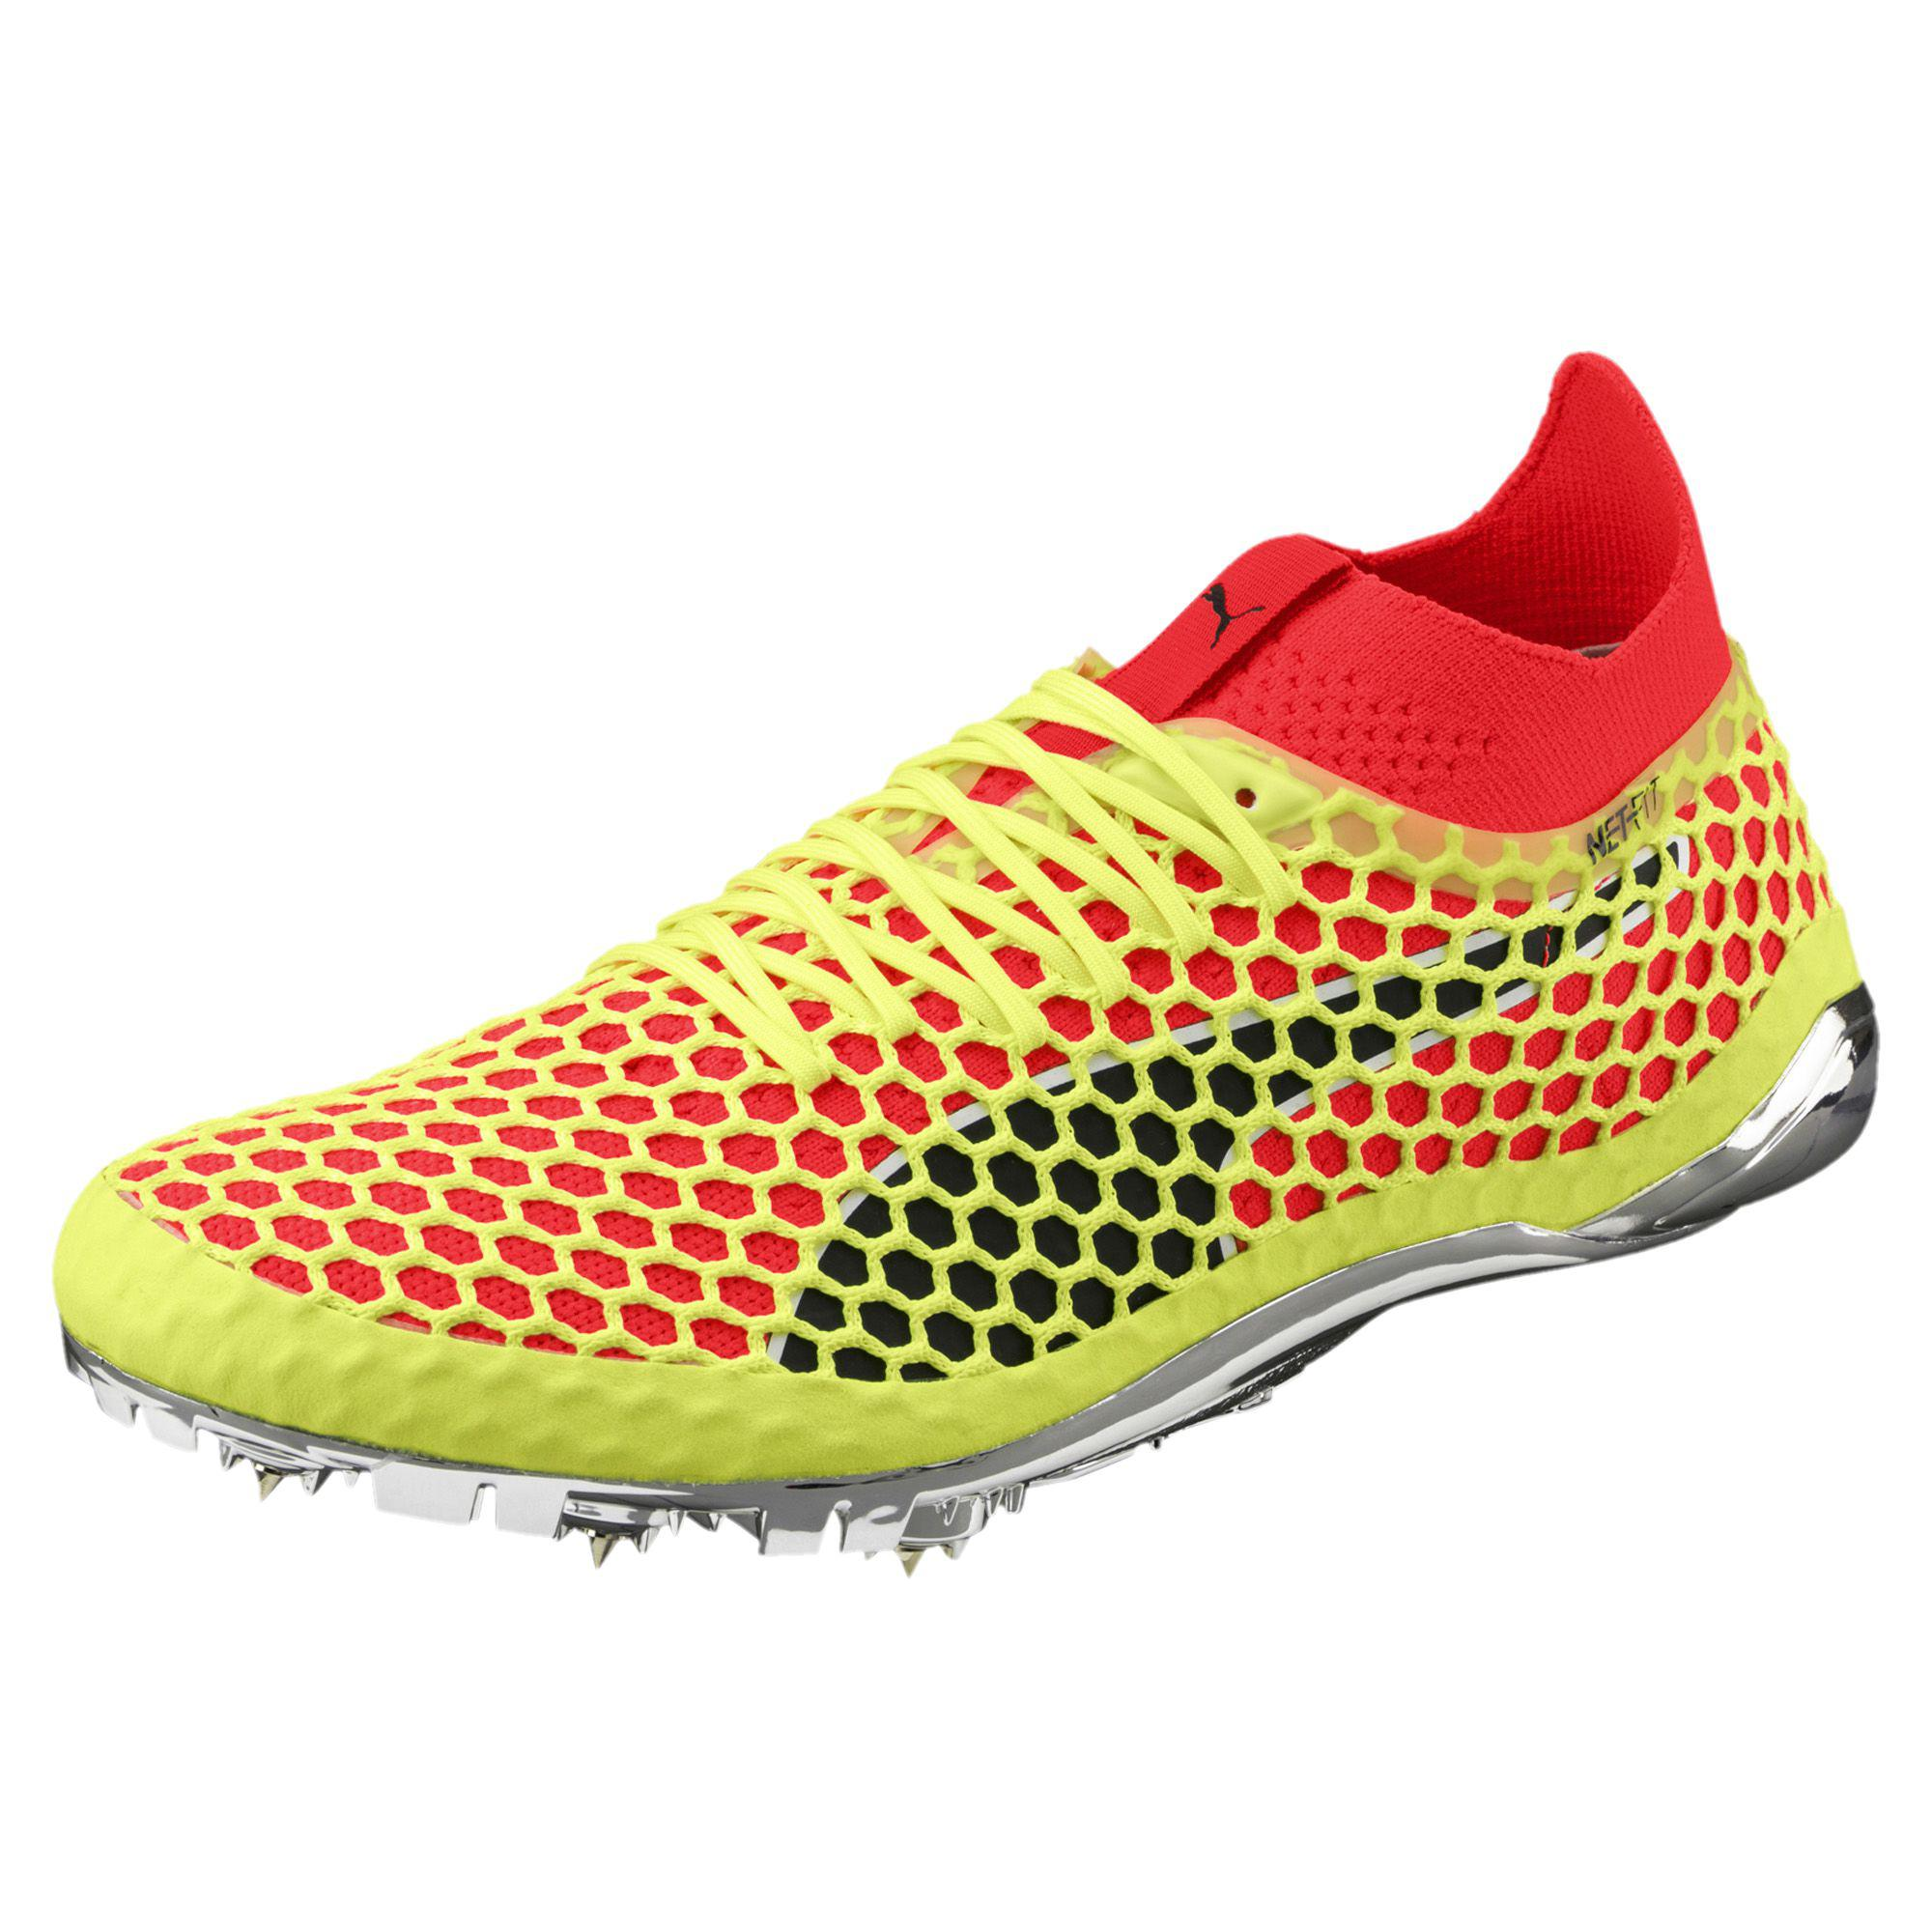 89ade414abd630 Lyst - PUMA Evospeed Netfit Sprint Running Shoes for Men